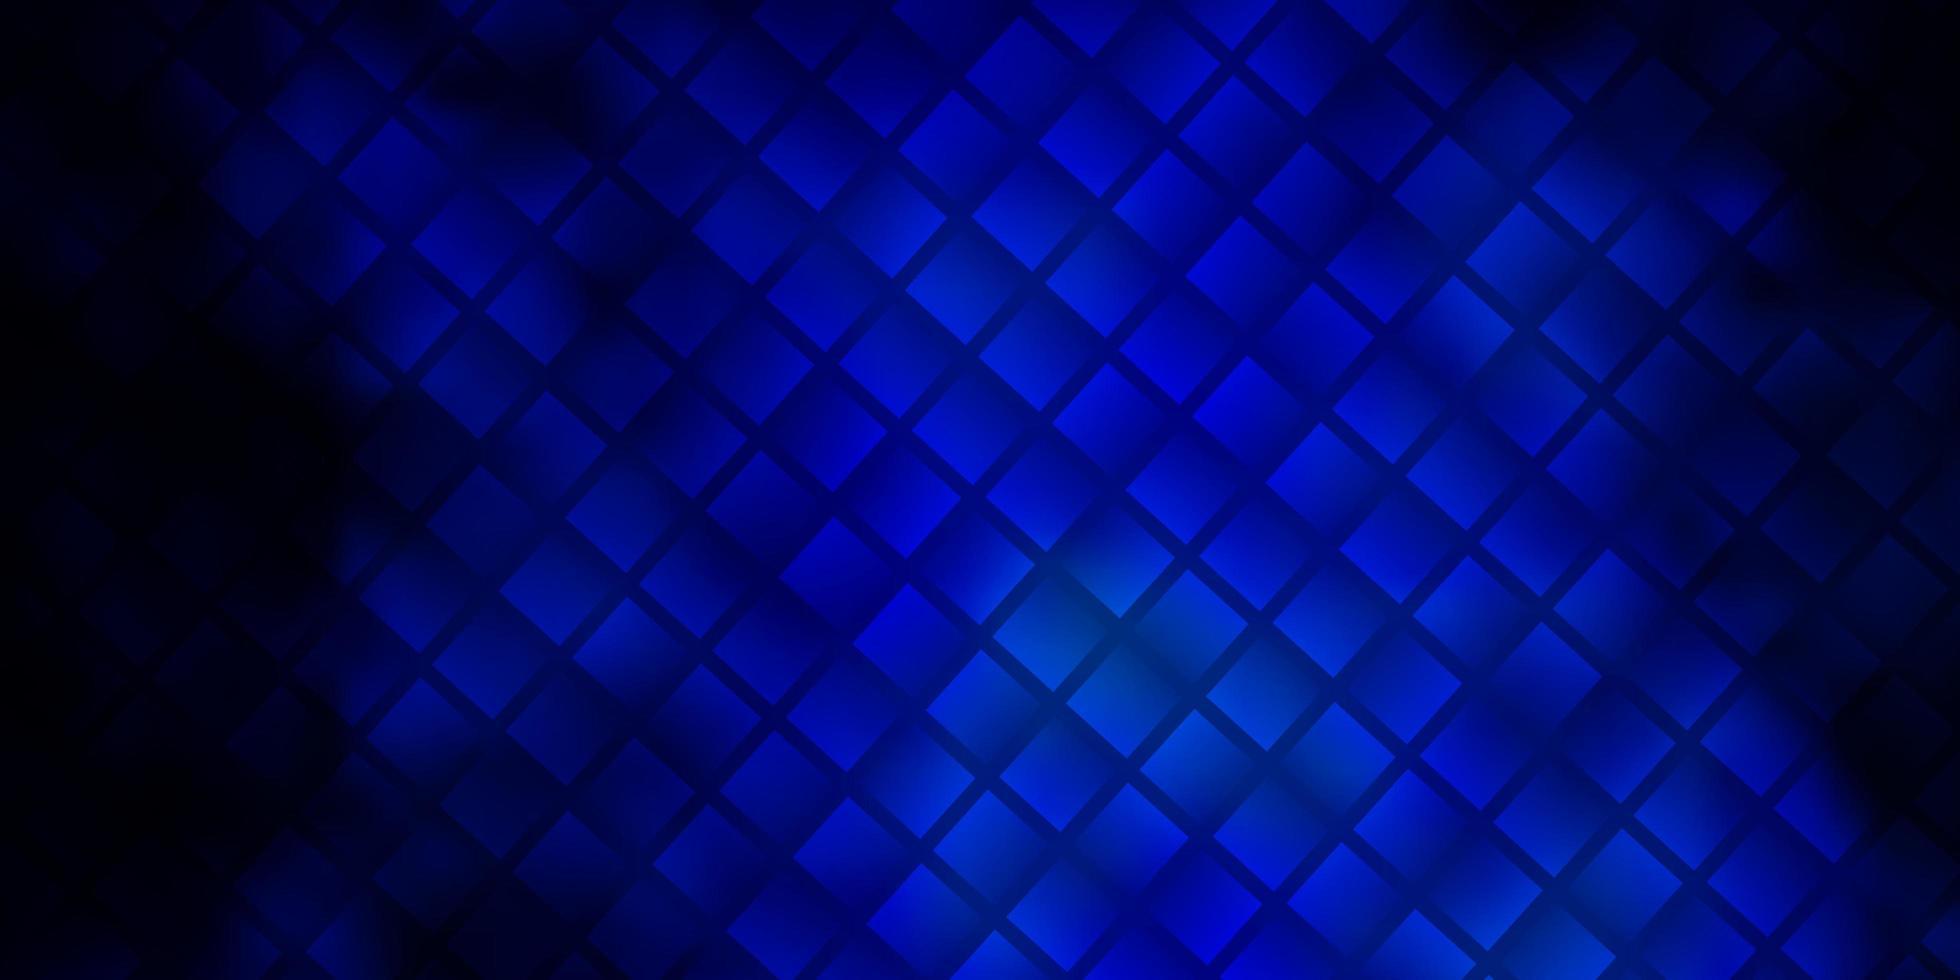 mörkblå vektorbakgrund med rektanglar. vektor